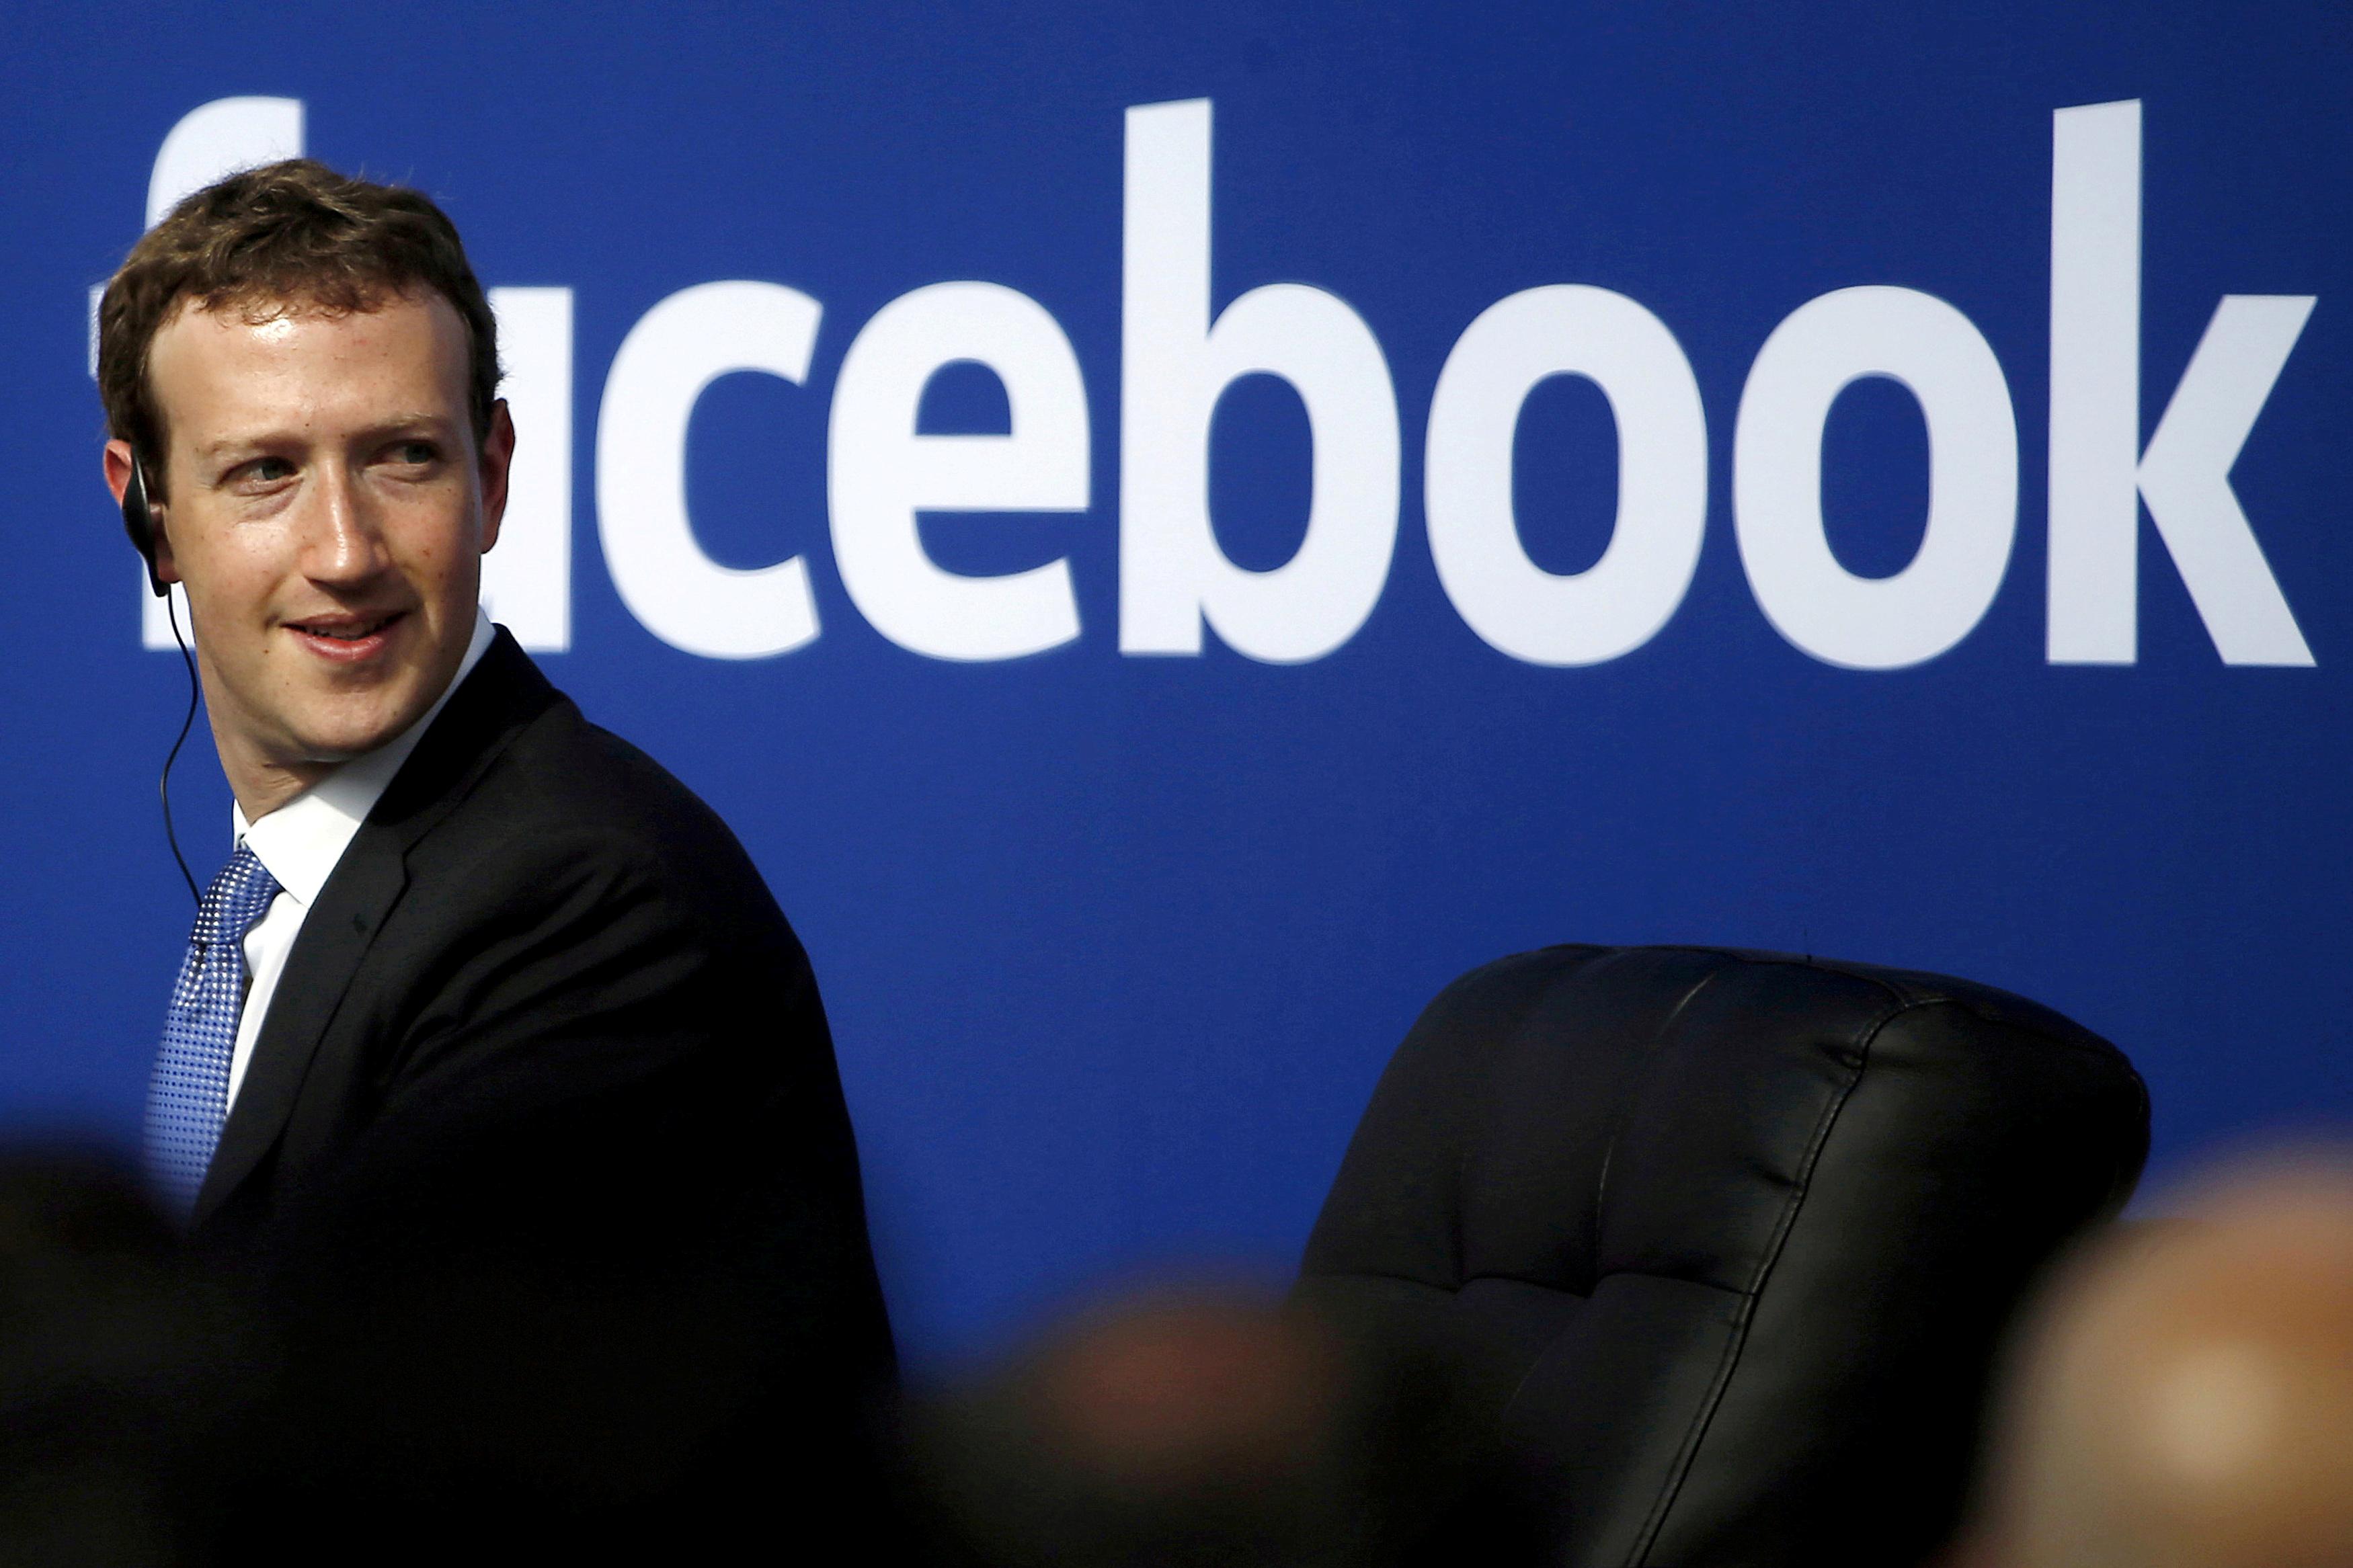 Facebook CEO Mark Zuckerberg in Menlo Park, Calif., on Sept. 27, 2015.